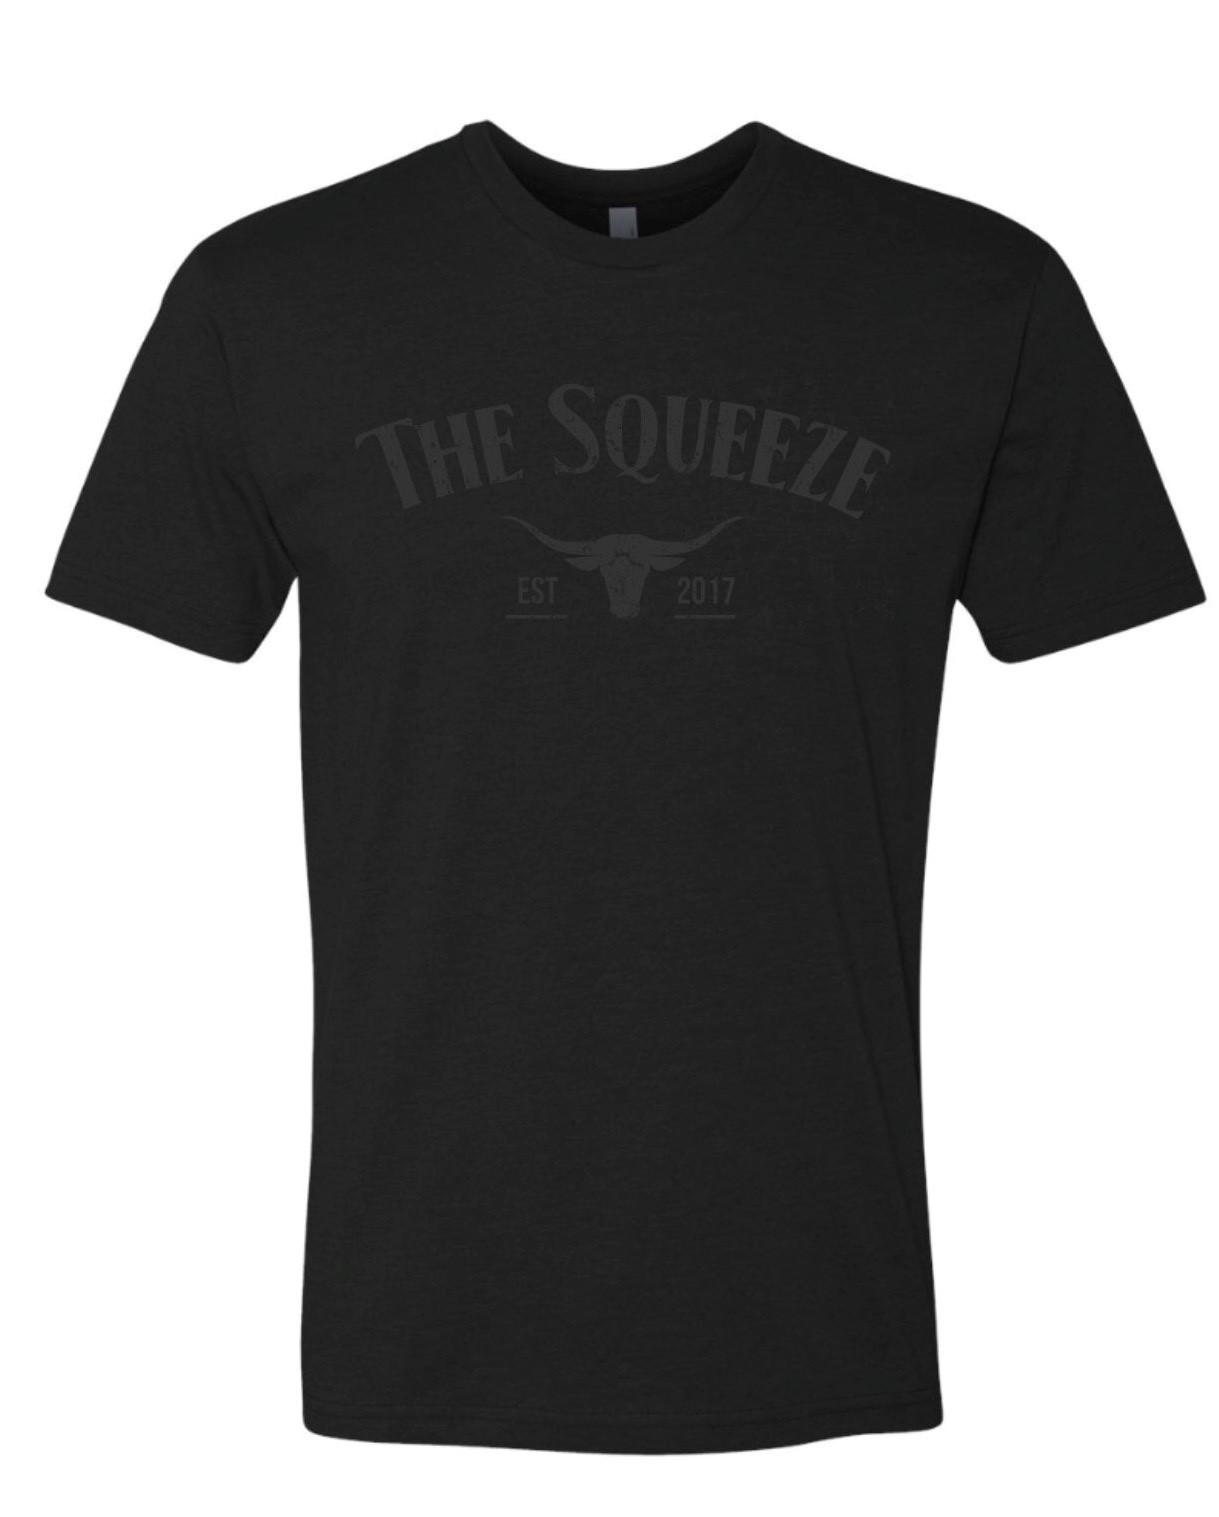 squeeze mens tshirt.jpg